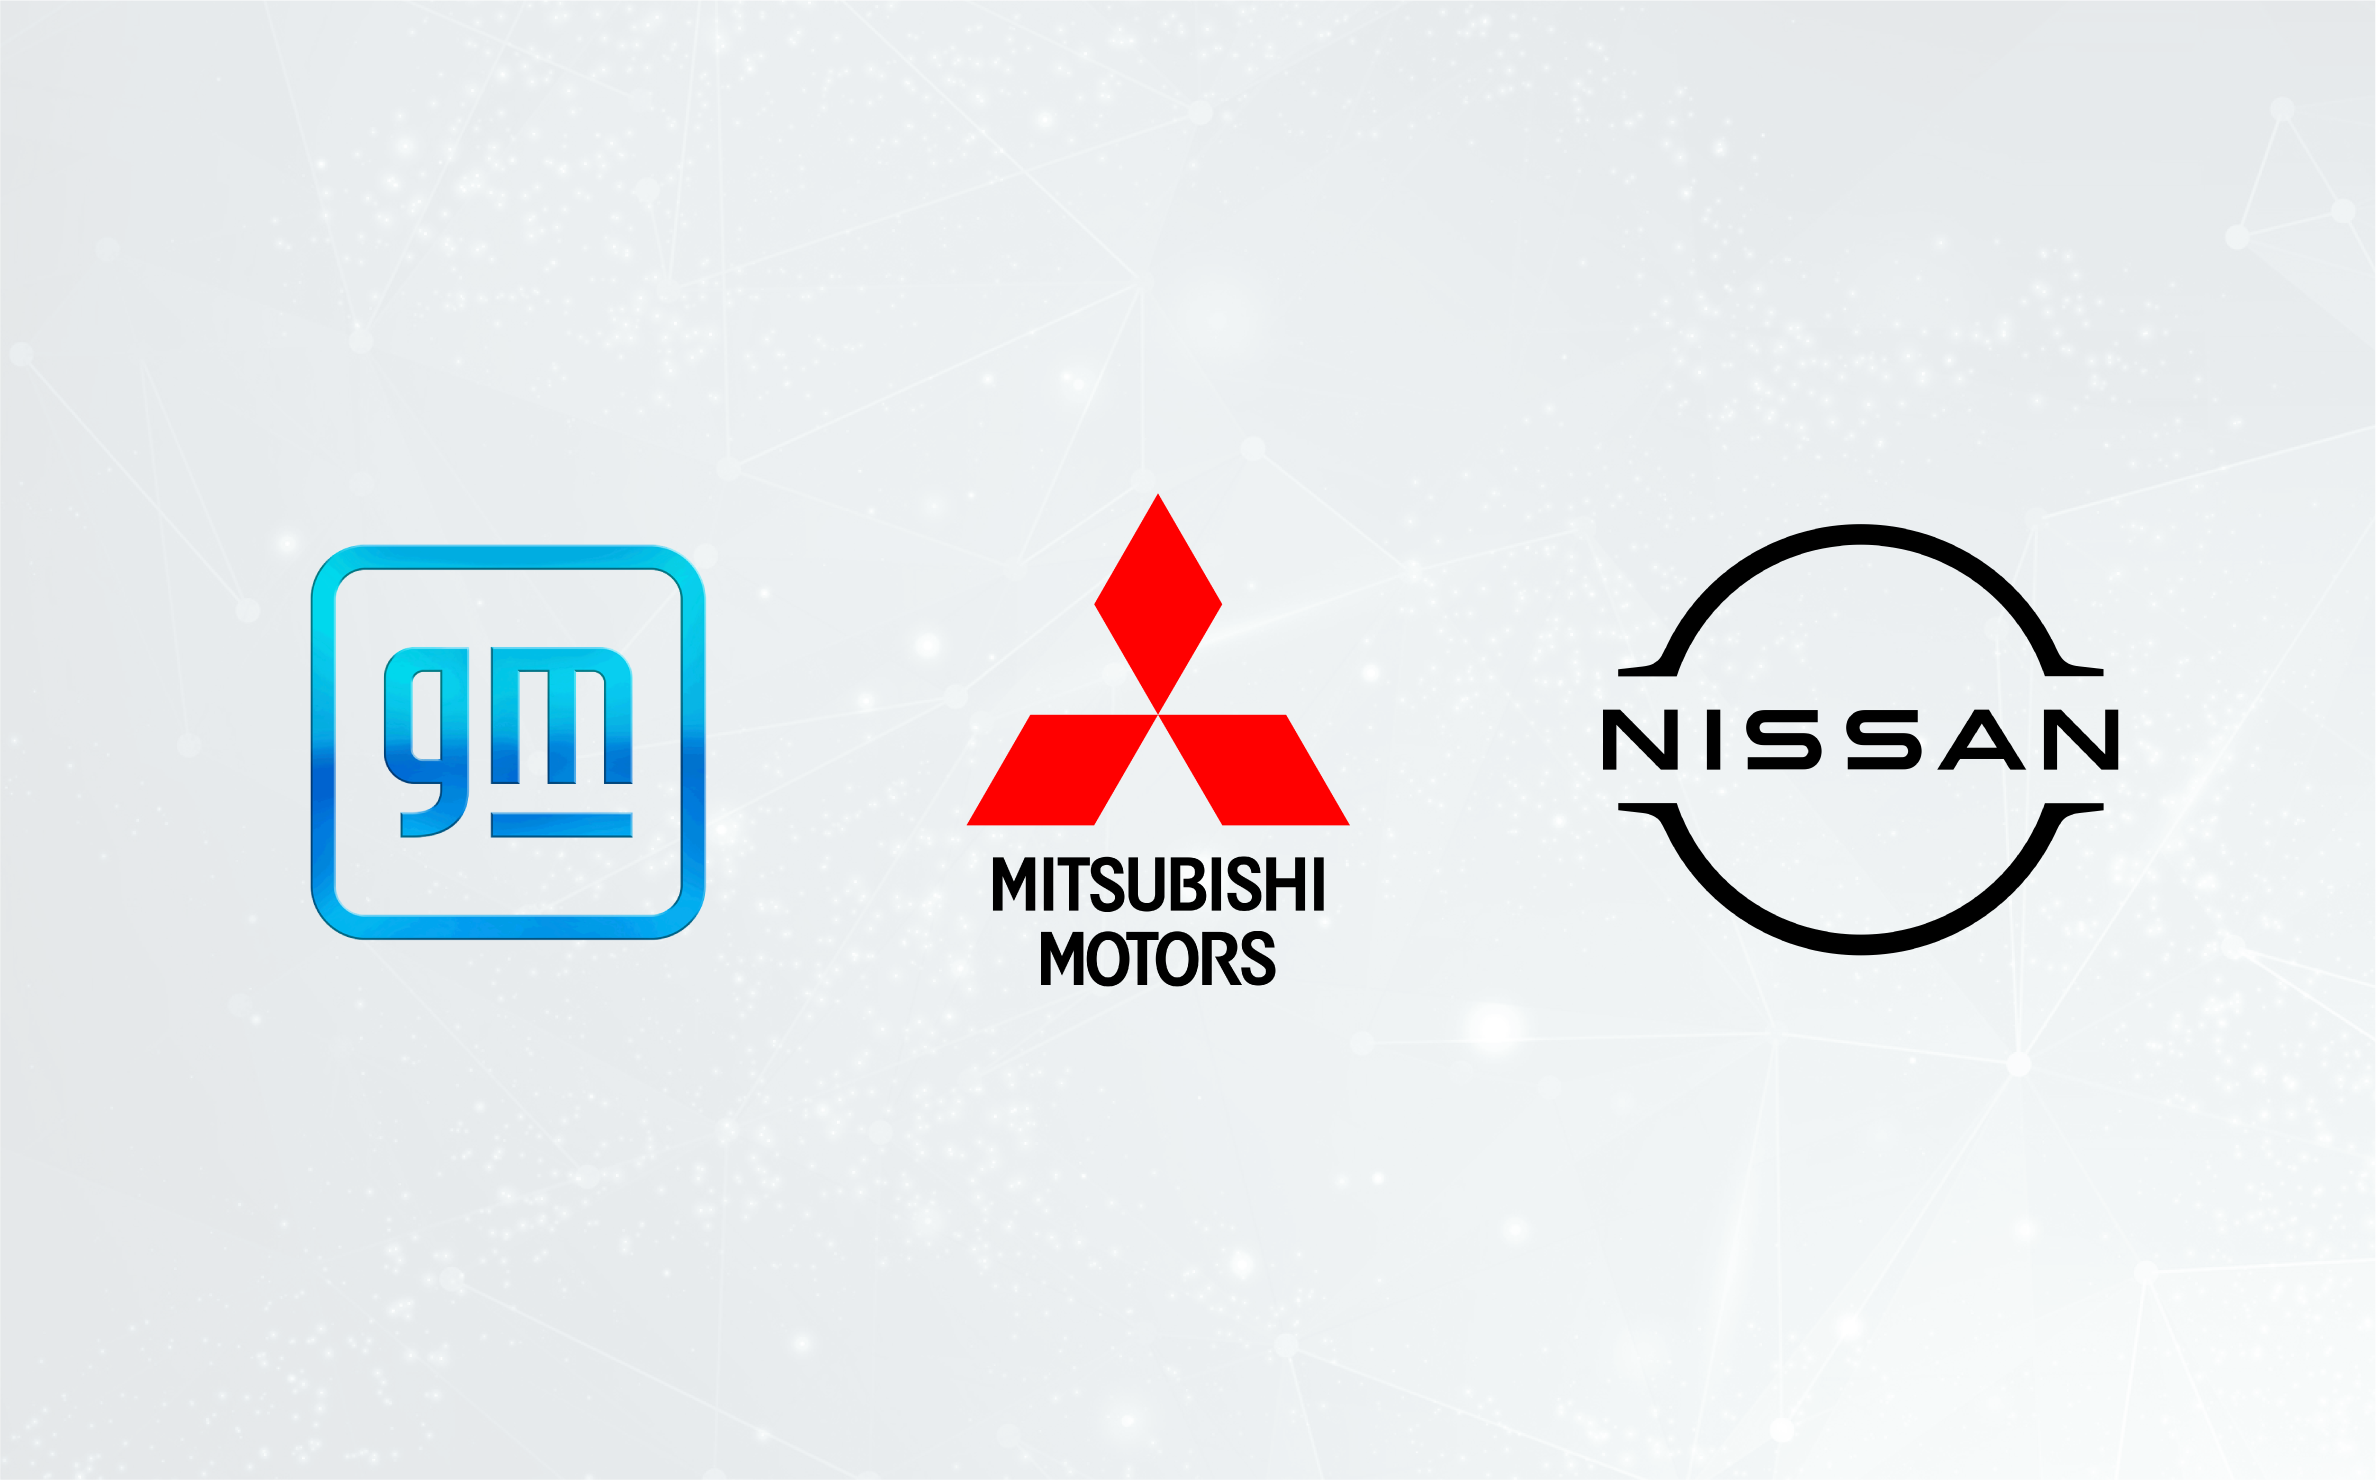 Automotive OEM partners